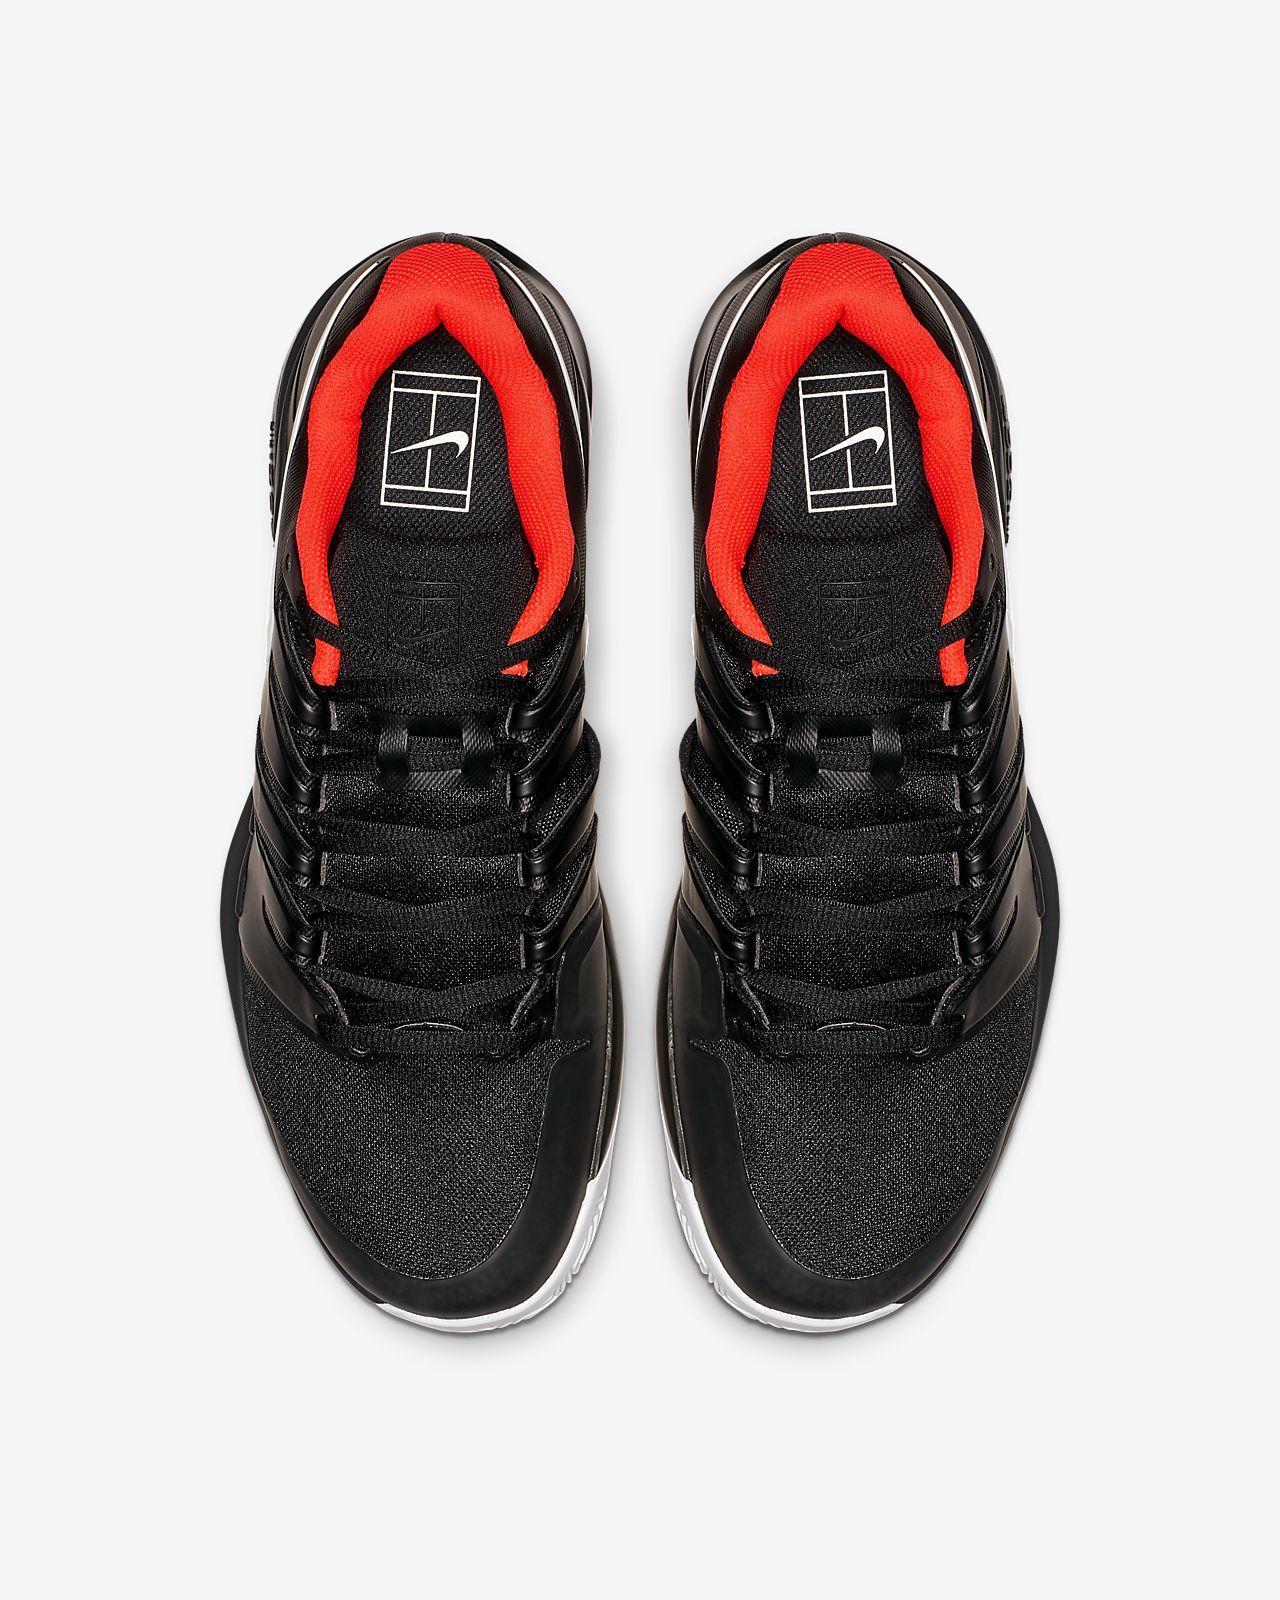 7d1440f3d9bb Nike Air Zoom Vapor X Clay Men s Tennis Shoe. Nike.com CA